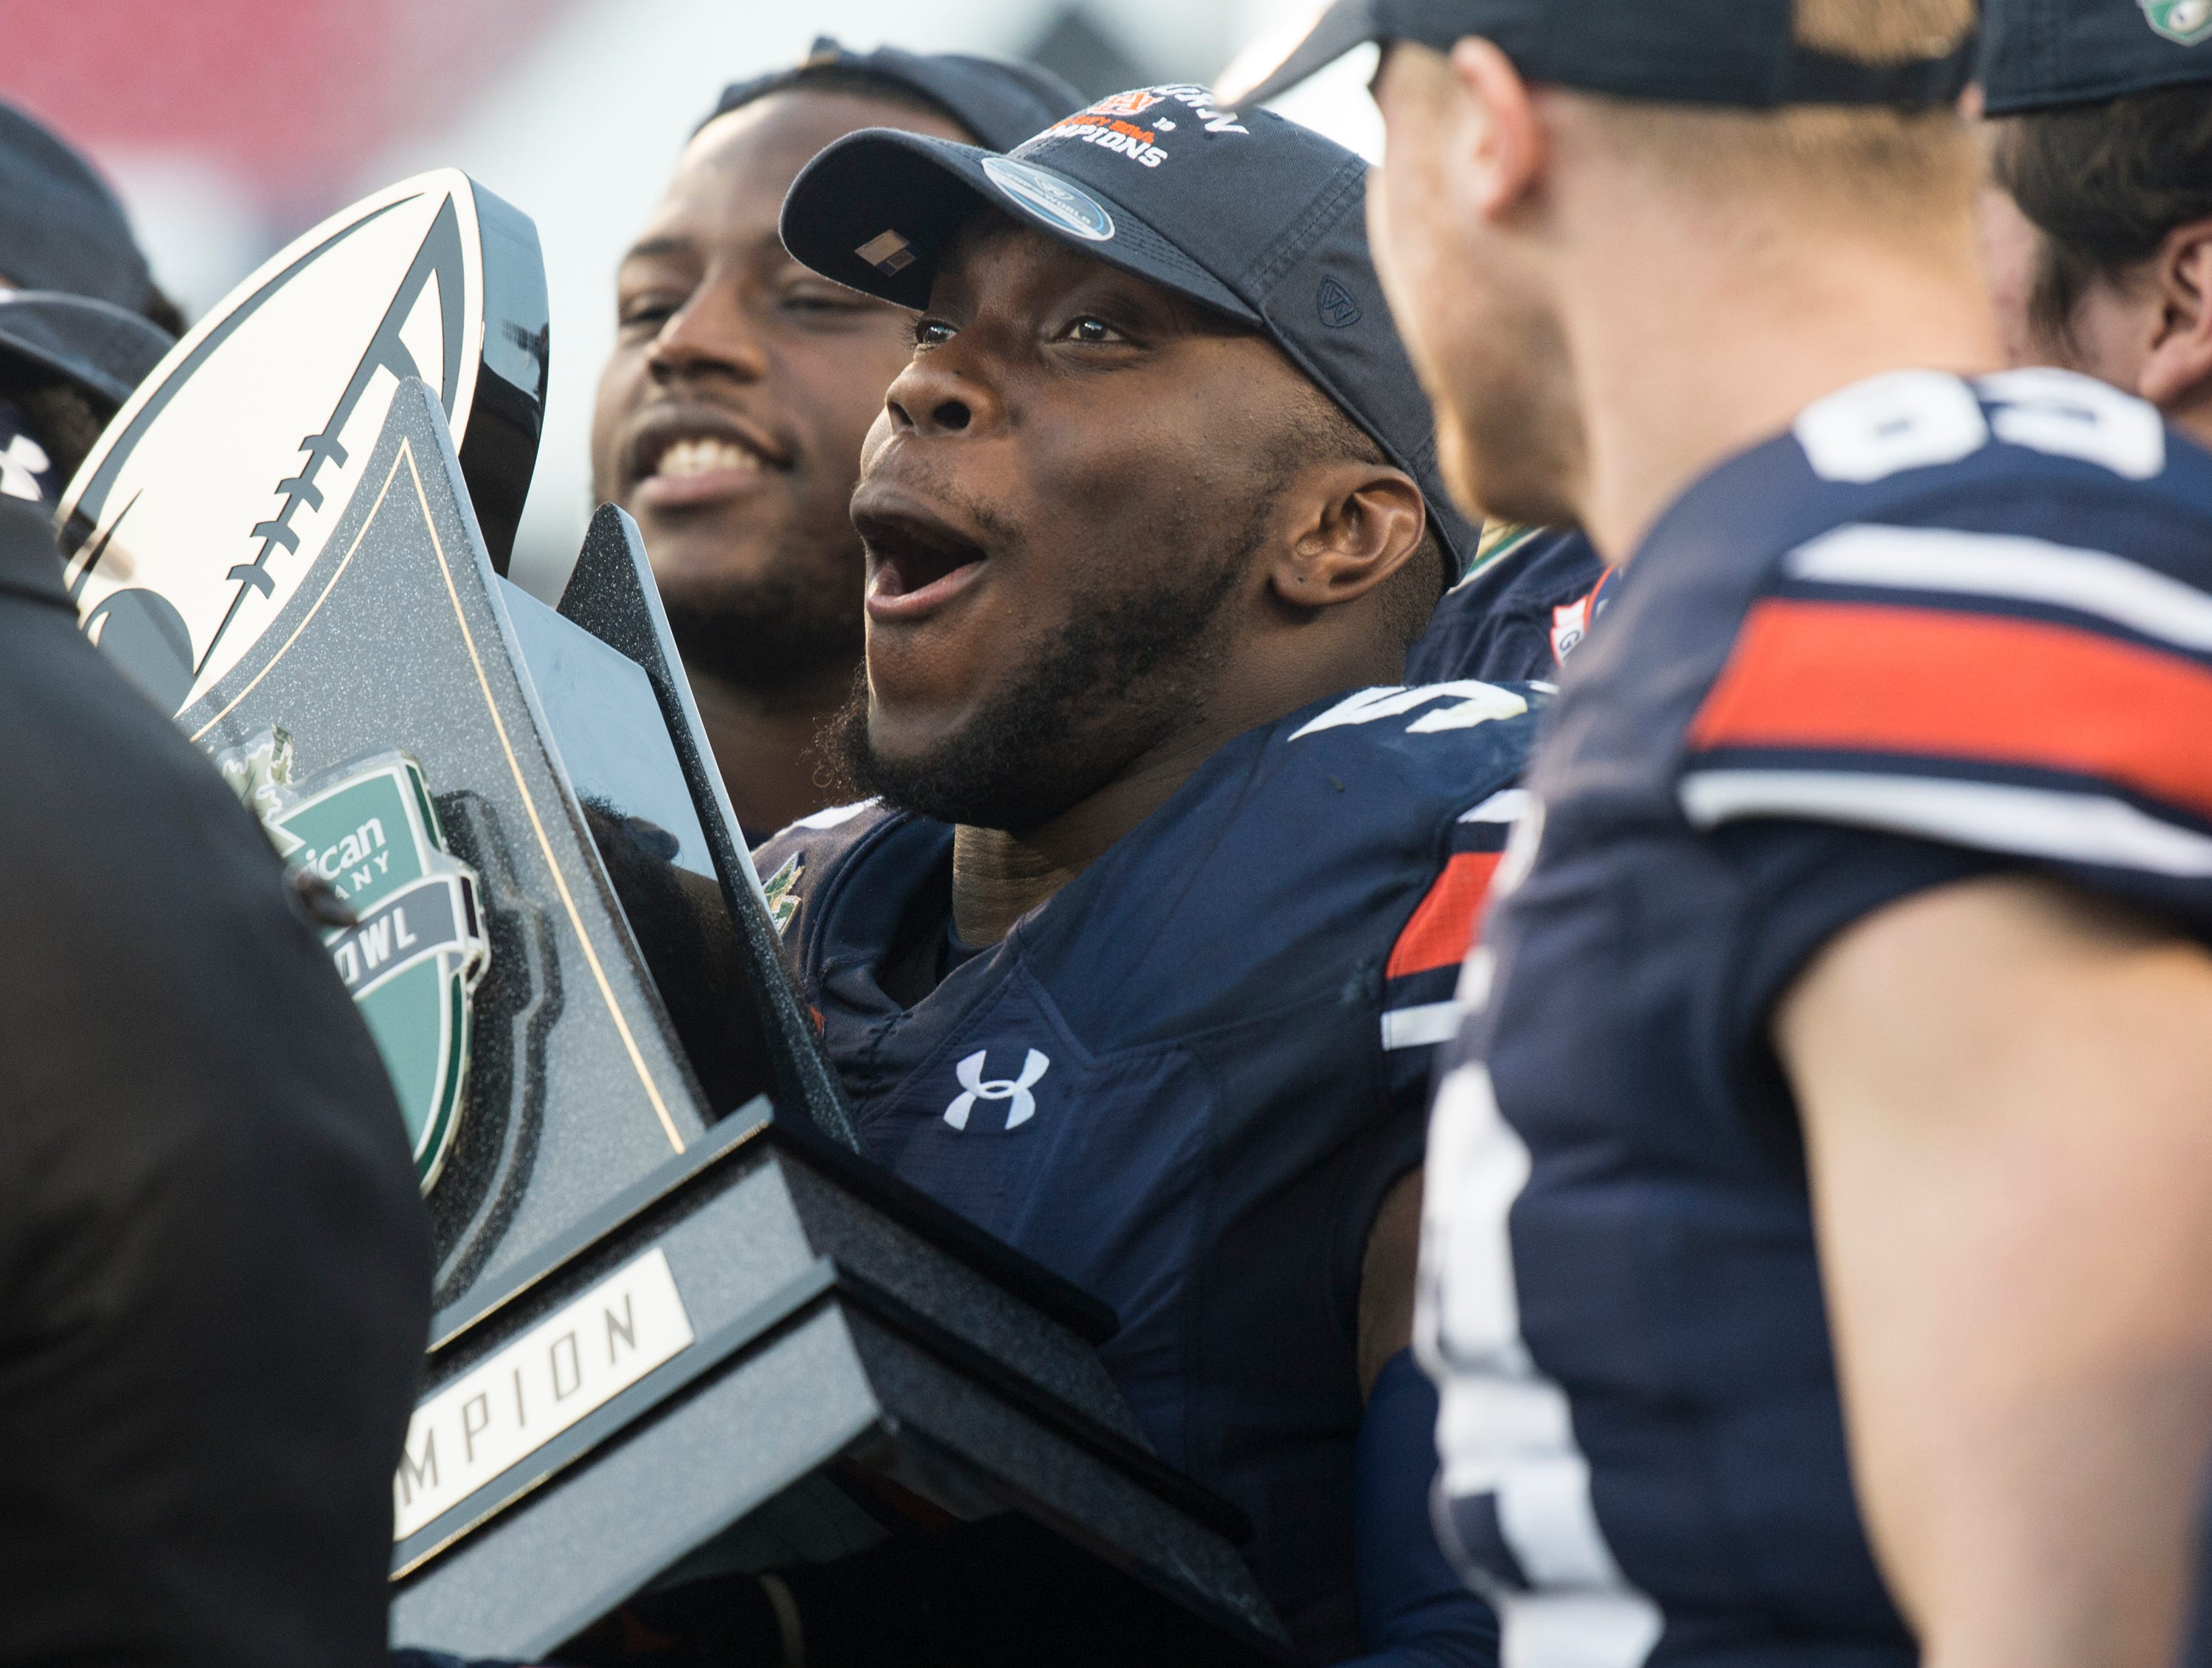 Auburn linebacker Deshaun Davis (57) holds the trophy after winning the Music City Bowl at Nissan Stadium in Nashville, Tenn., on Friday, Dec. 28, 2018. Auburn defeated Purdue 63-14.